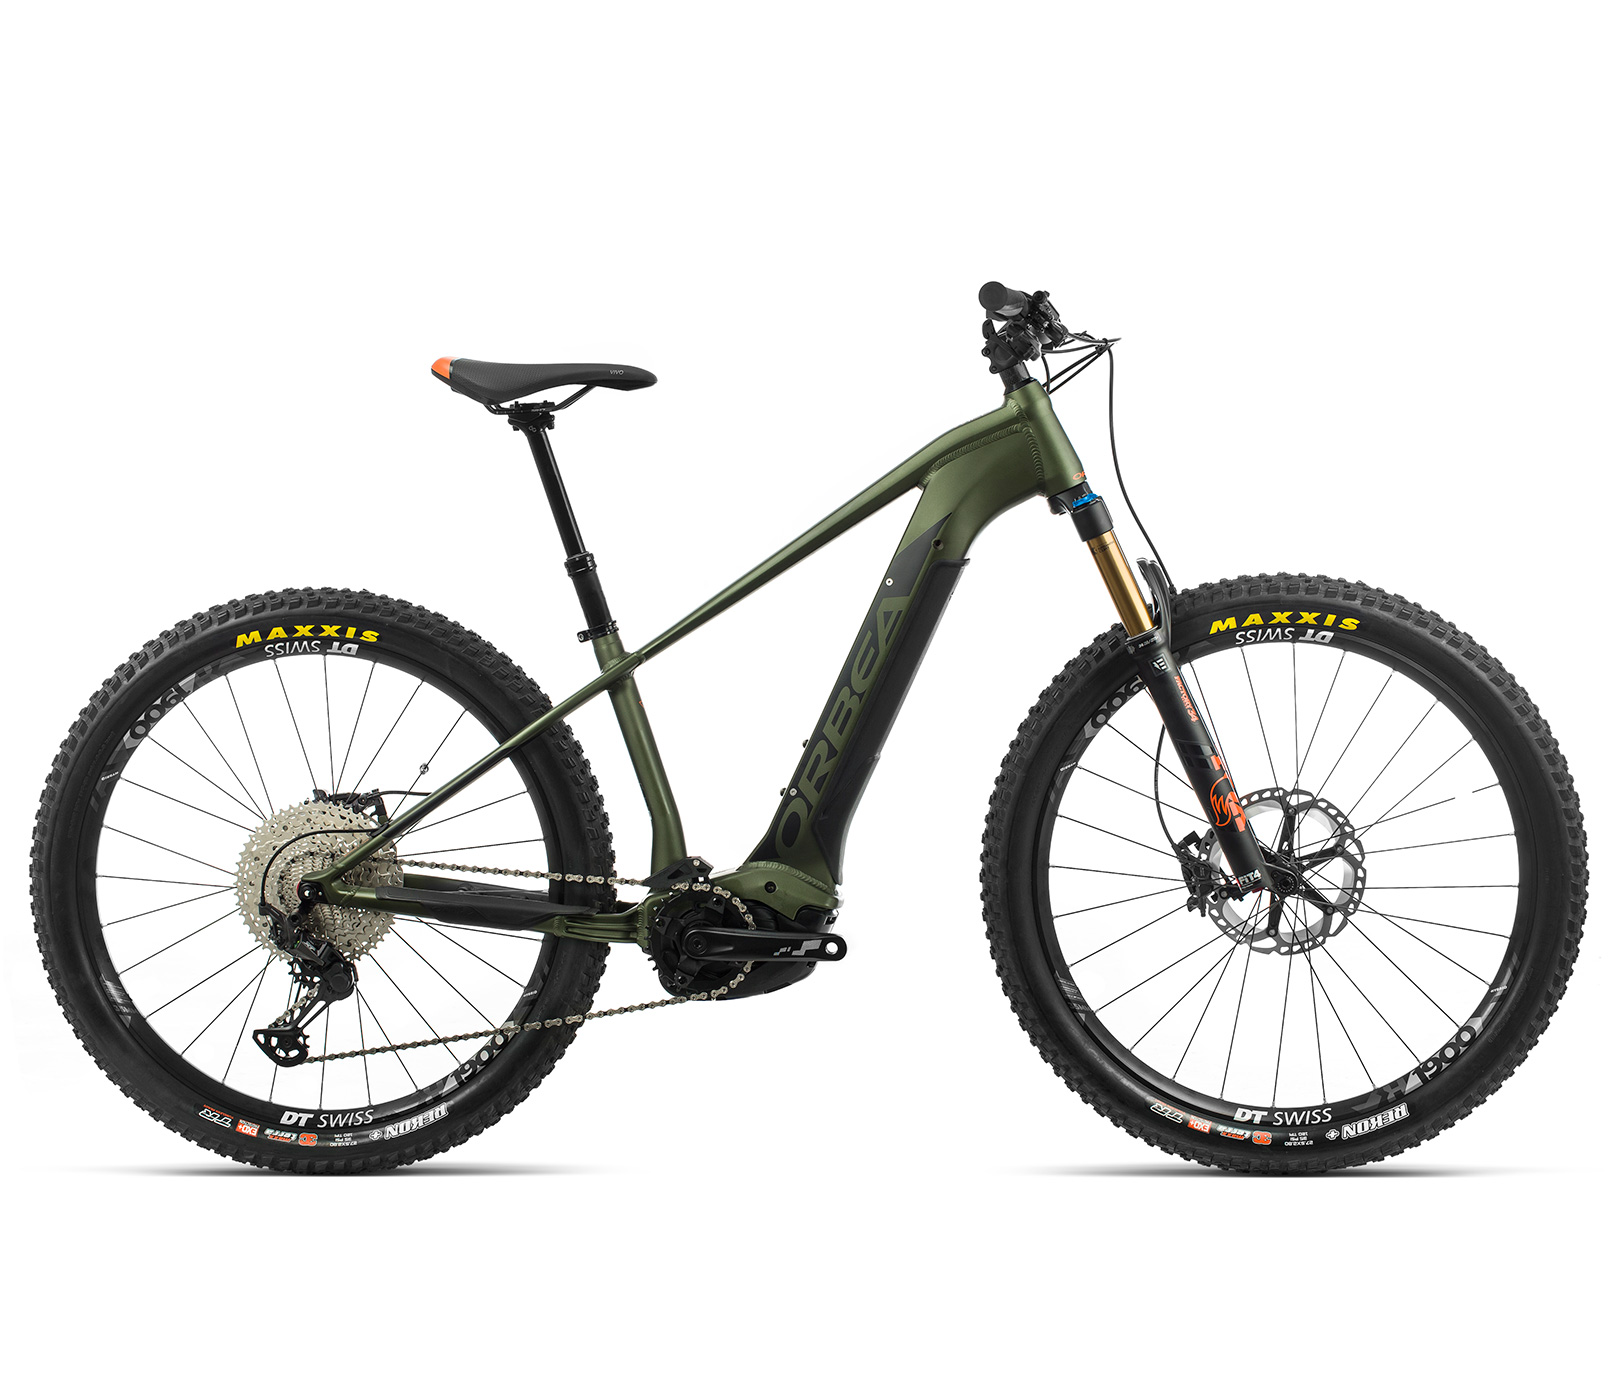 ORBEA WILD HT10 27 ebike - GROEN / ZWART (DOF) @G-Bikes